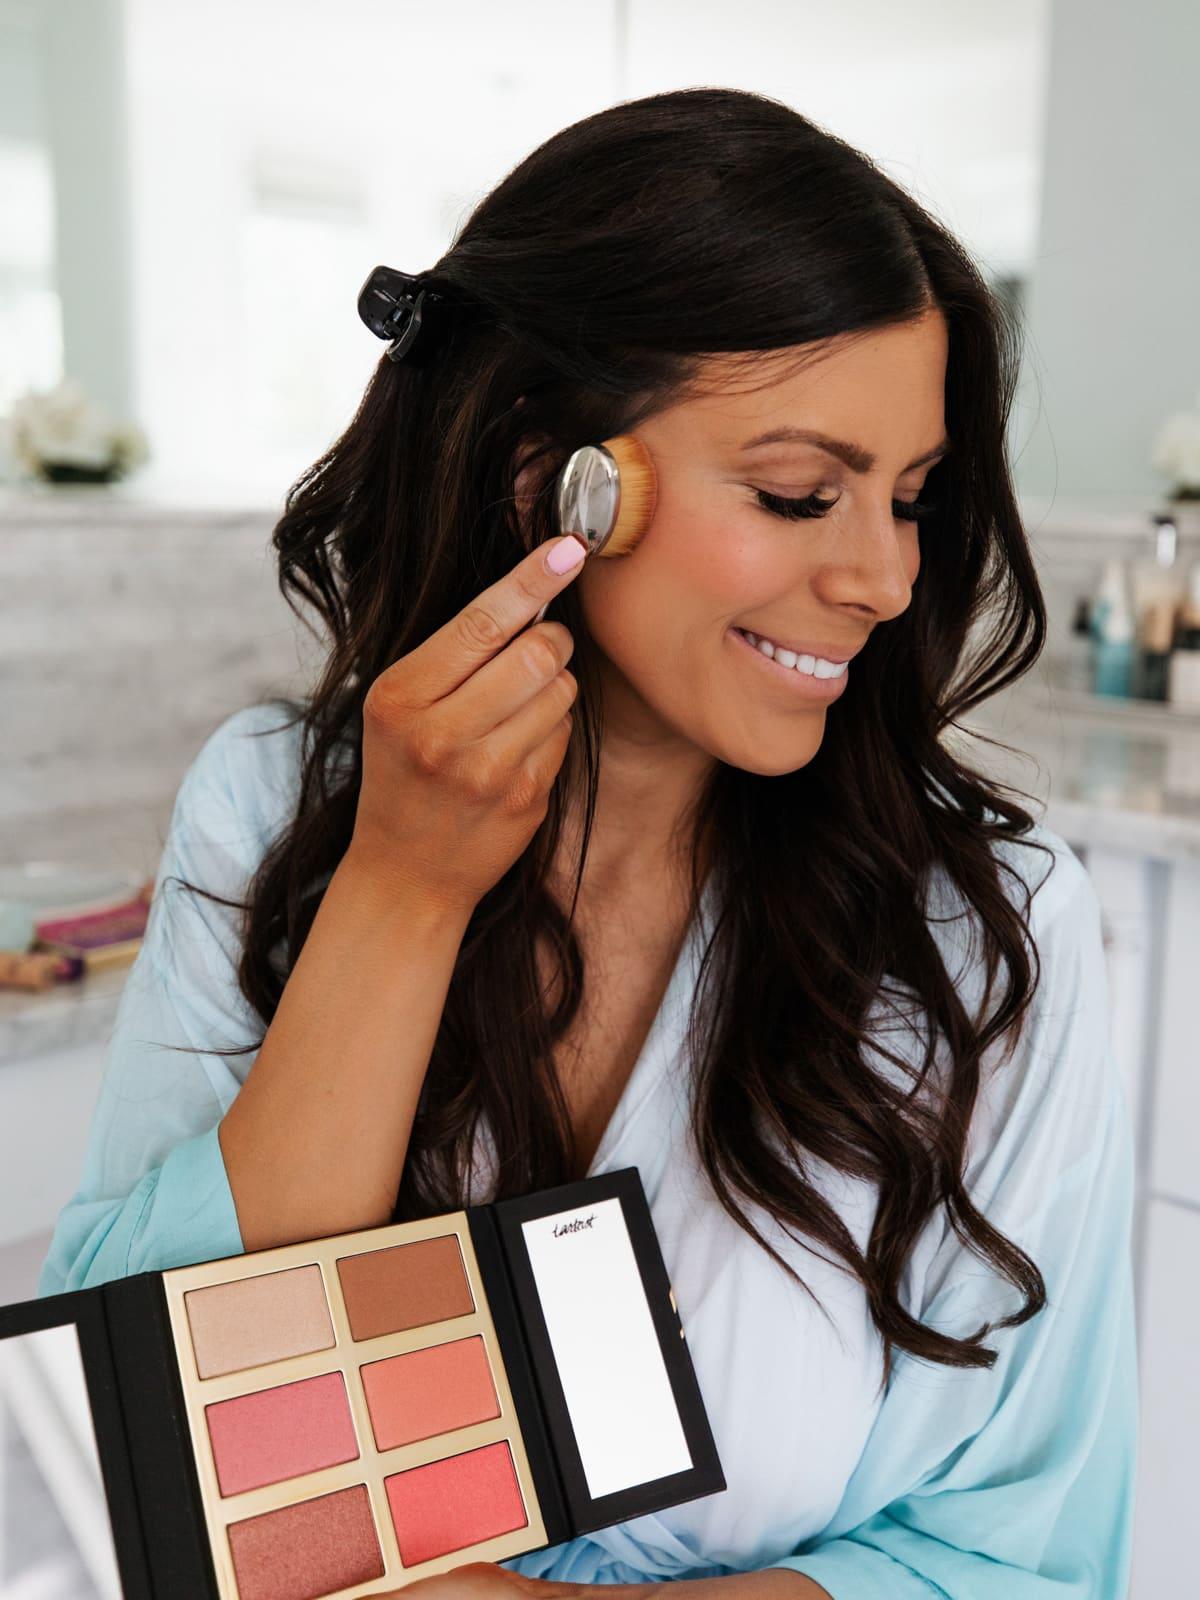 highlighter and blush palette from tarte